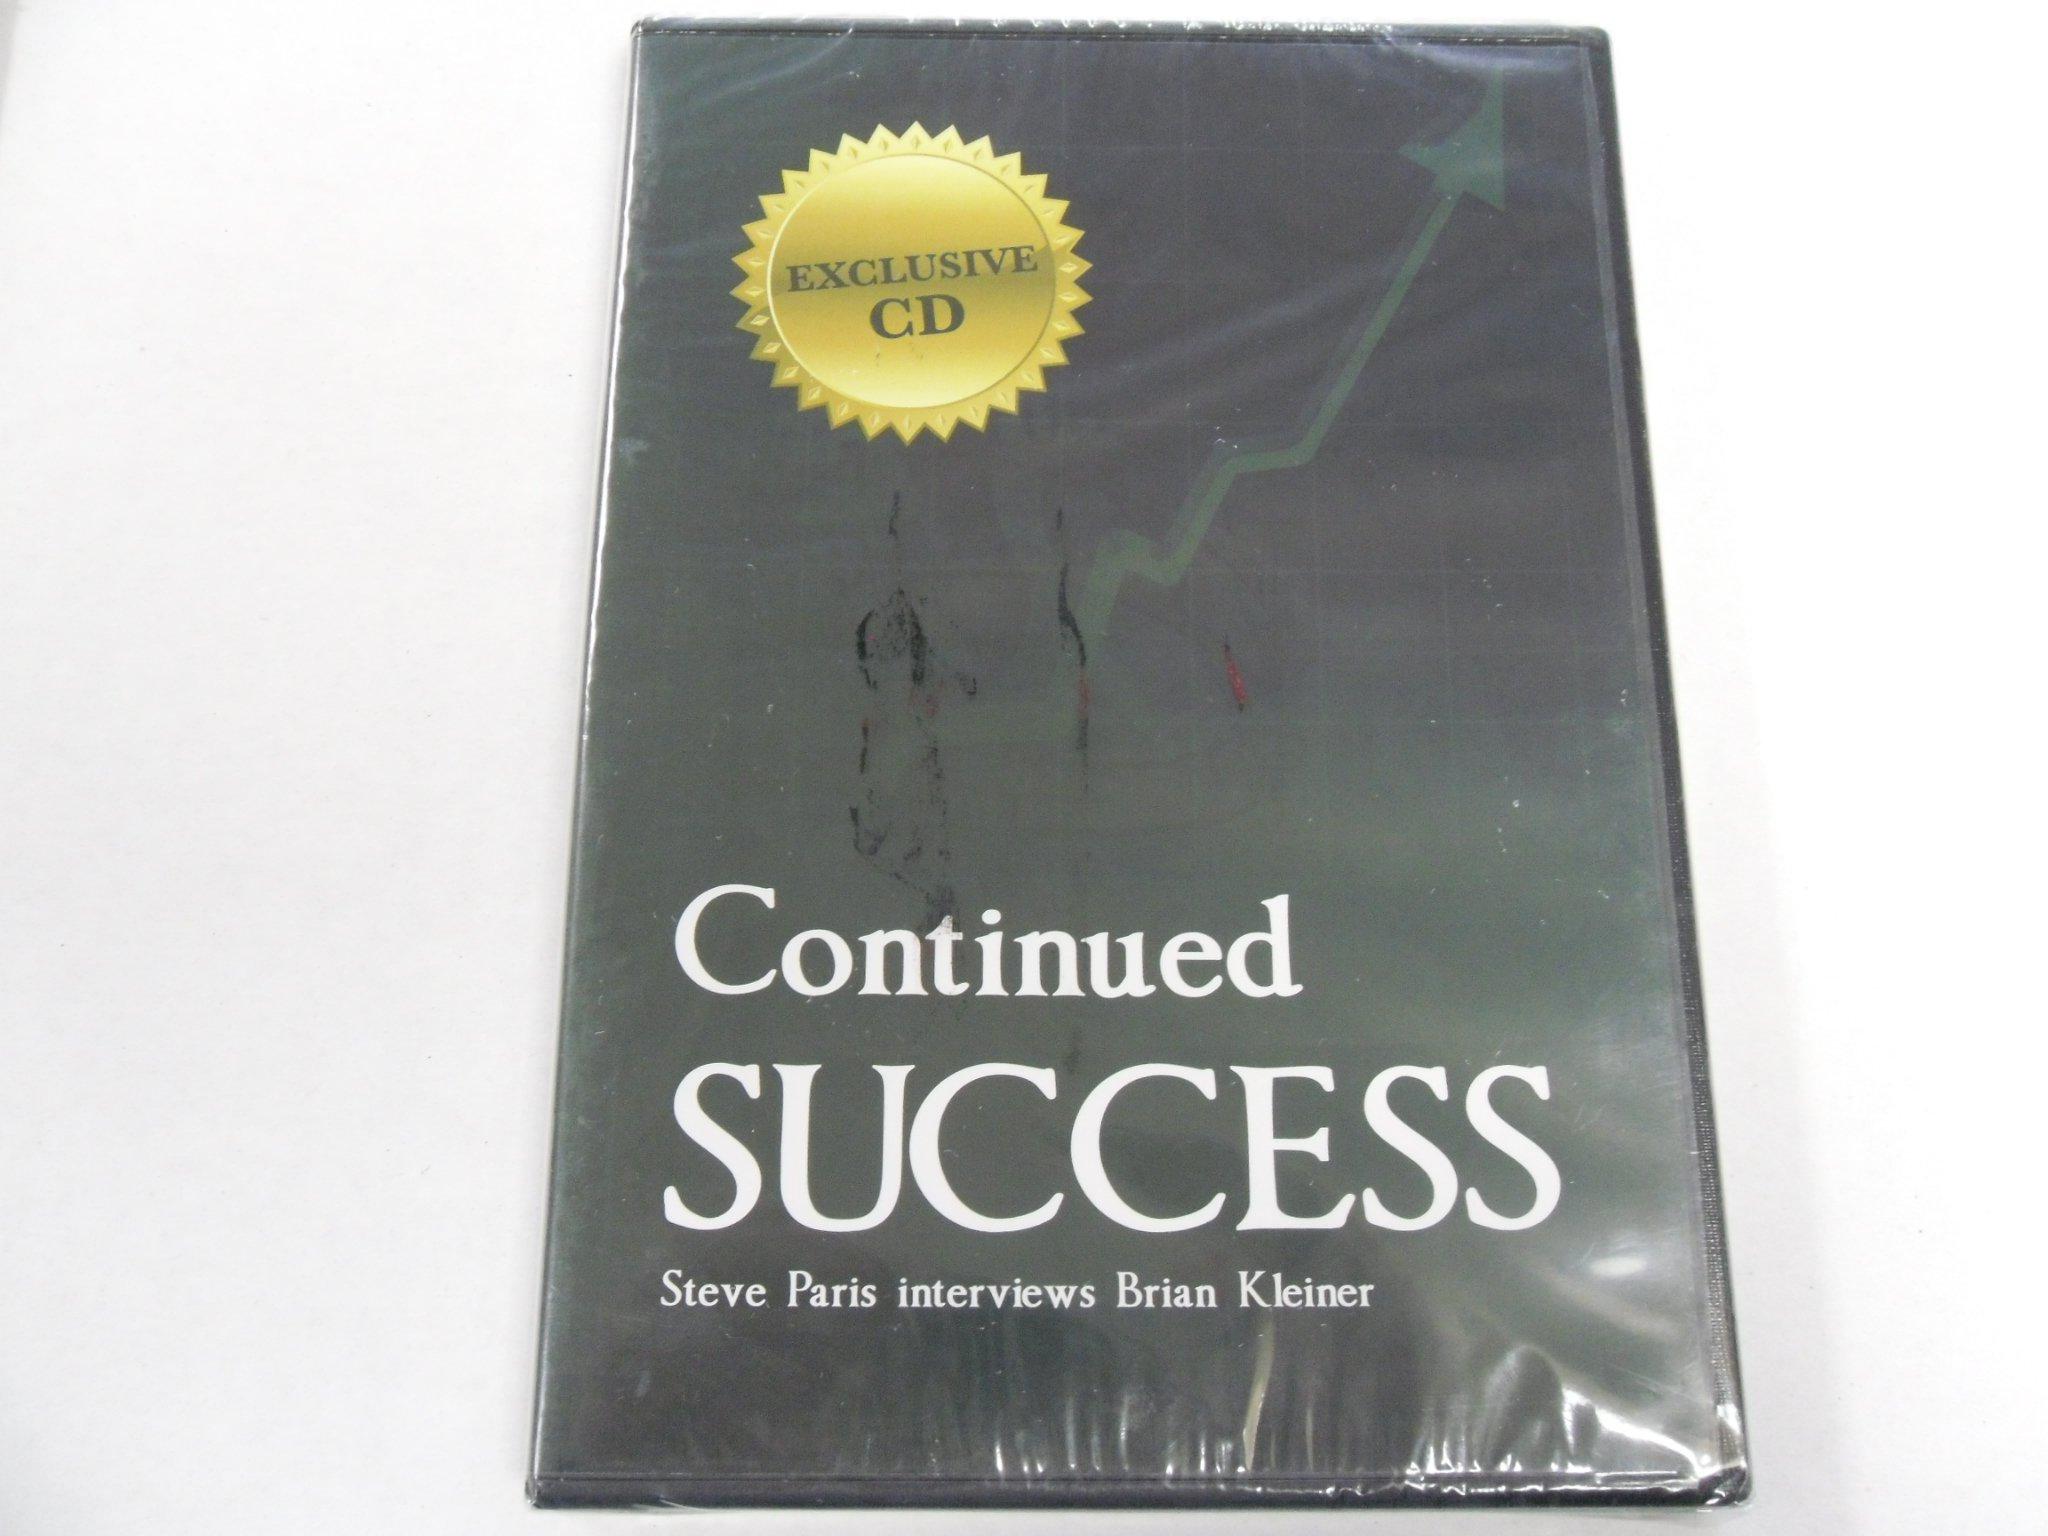 Continued Success Steve Paris interview Brian Kleiner